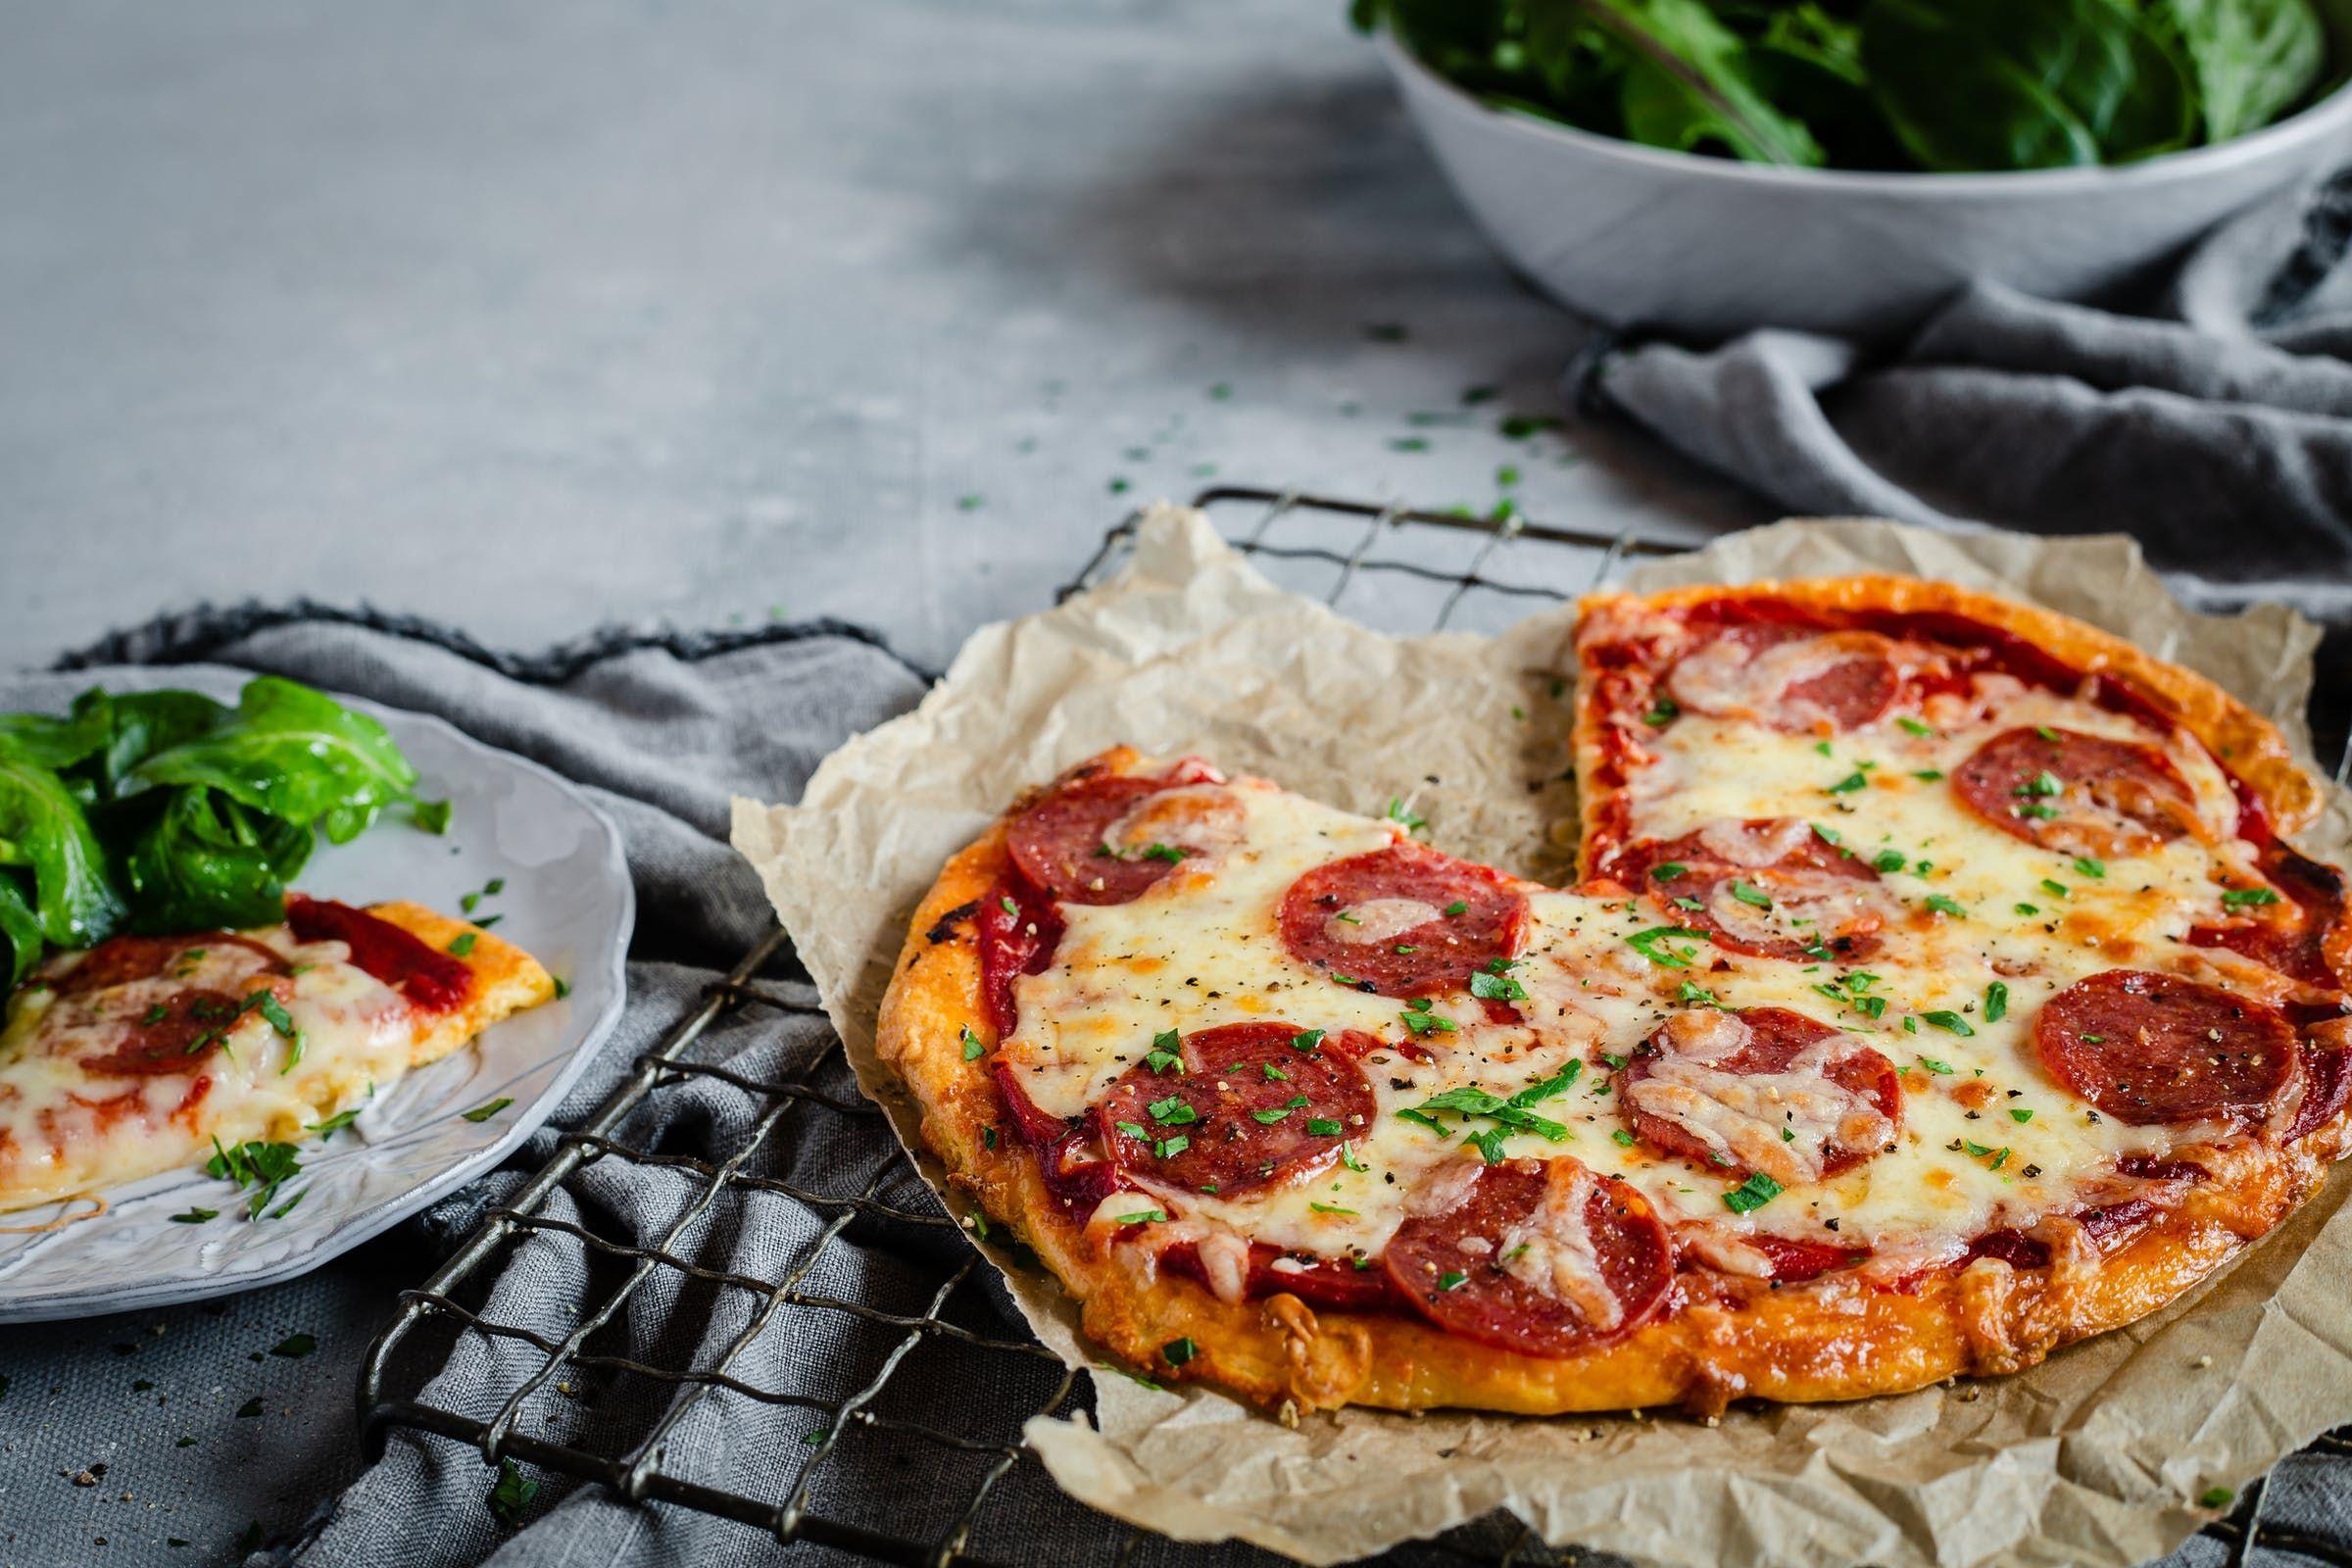 Keto Pizza The Best Pizza Recipe Ever With Video Diet Doctor Recipe Best Pizza Recipe Ever Good Pizza Pizza Recipes